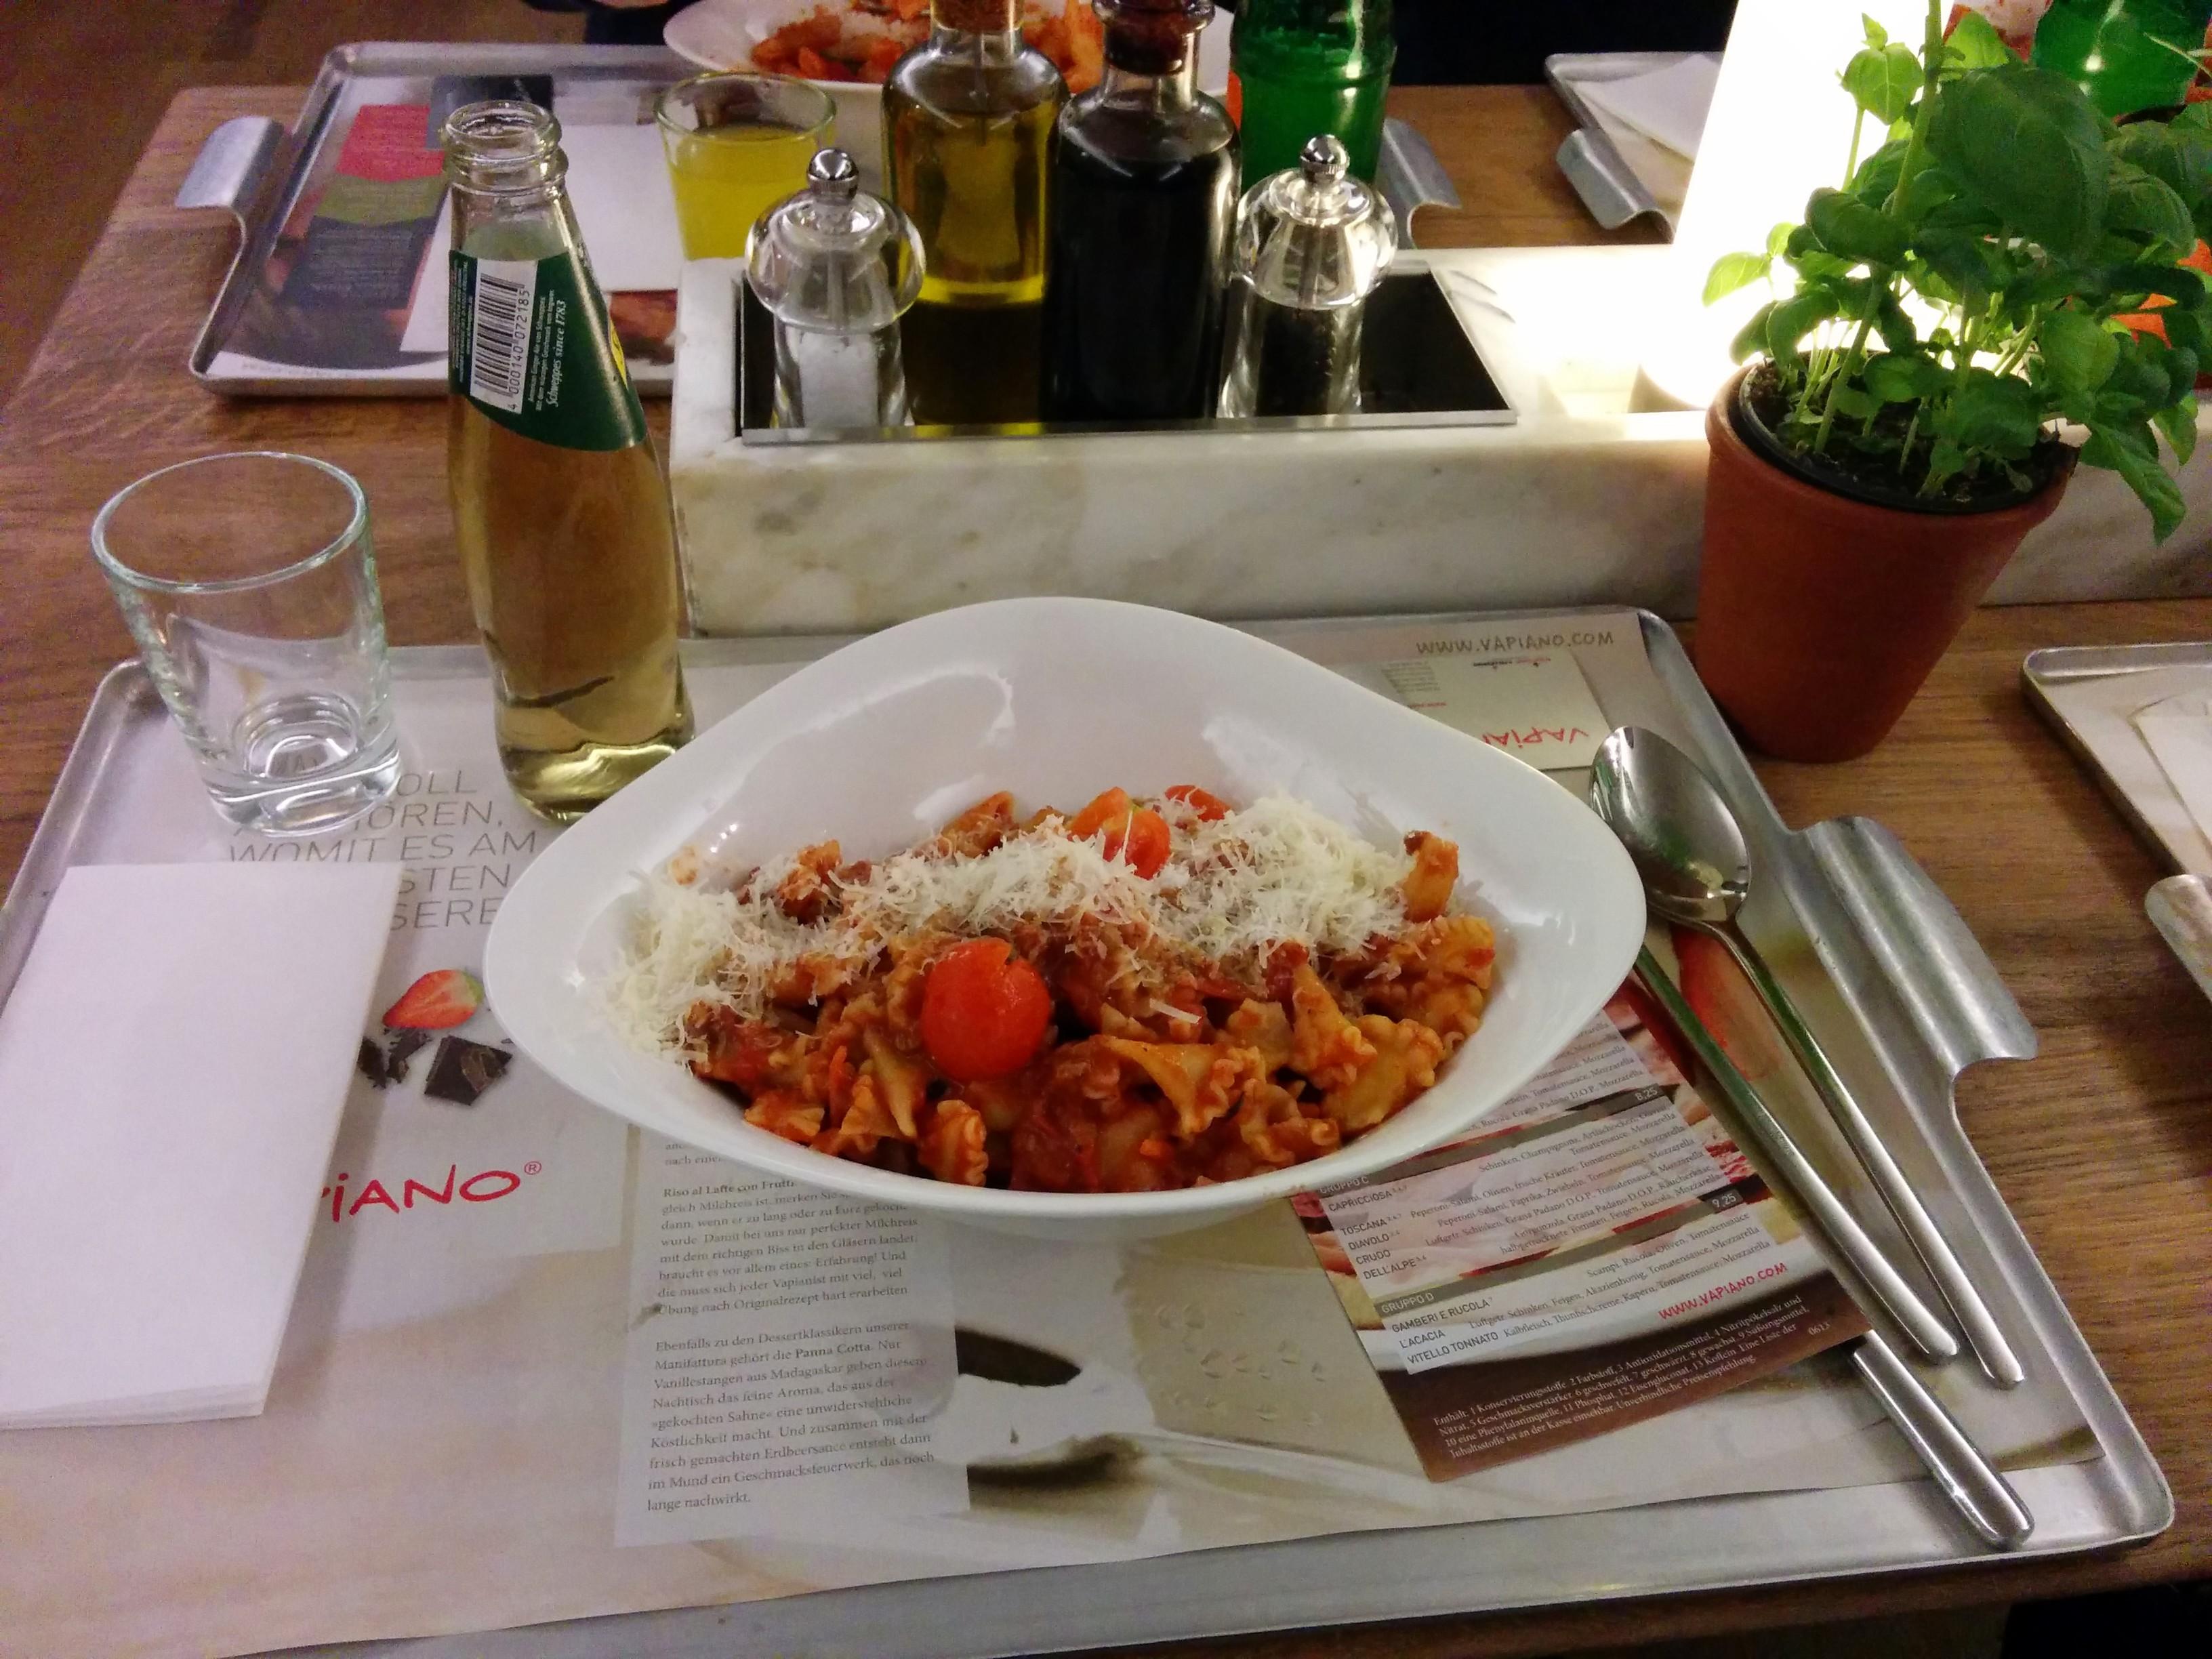 https://foodloader.net/nico_2013-12-22_vapiano_campanelle-mit-bolognese-sauce.jpg